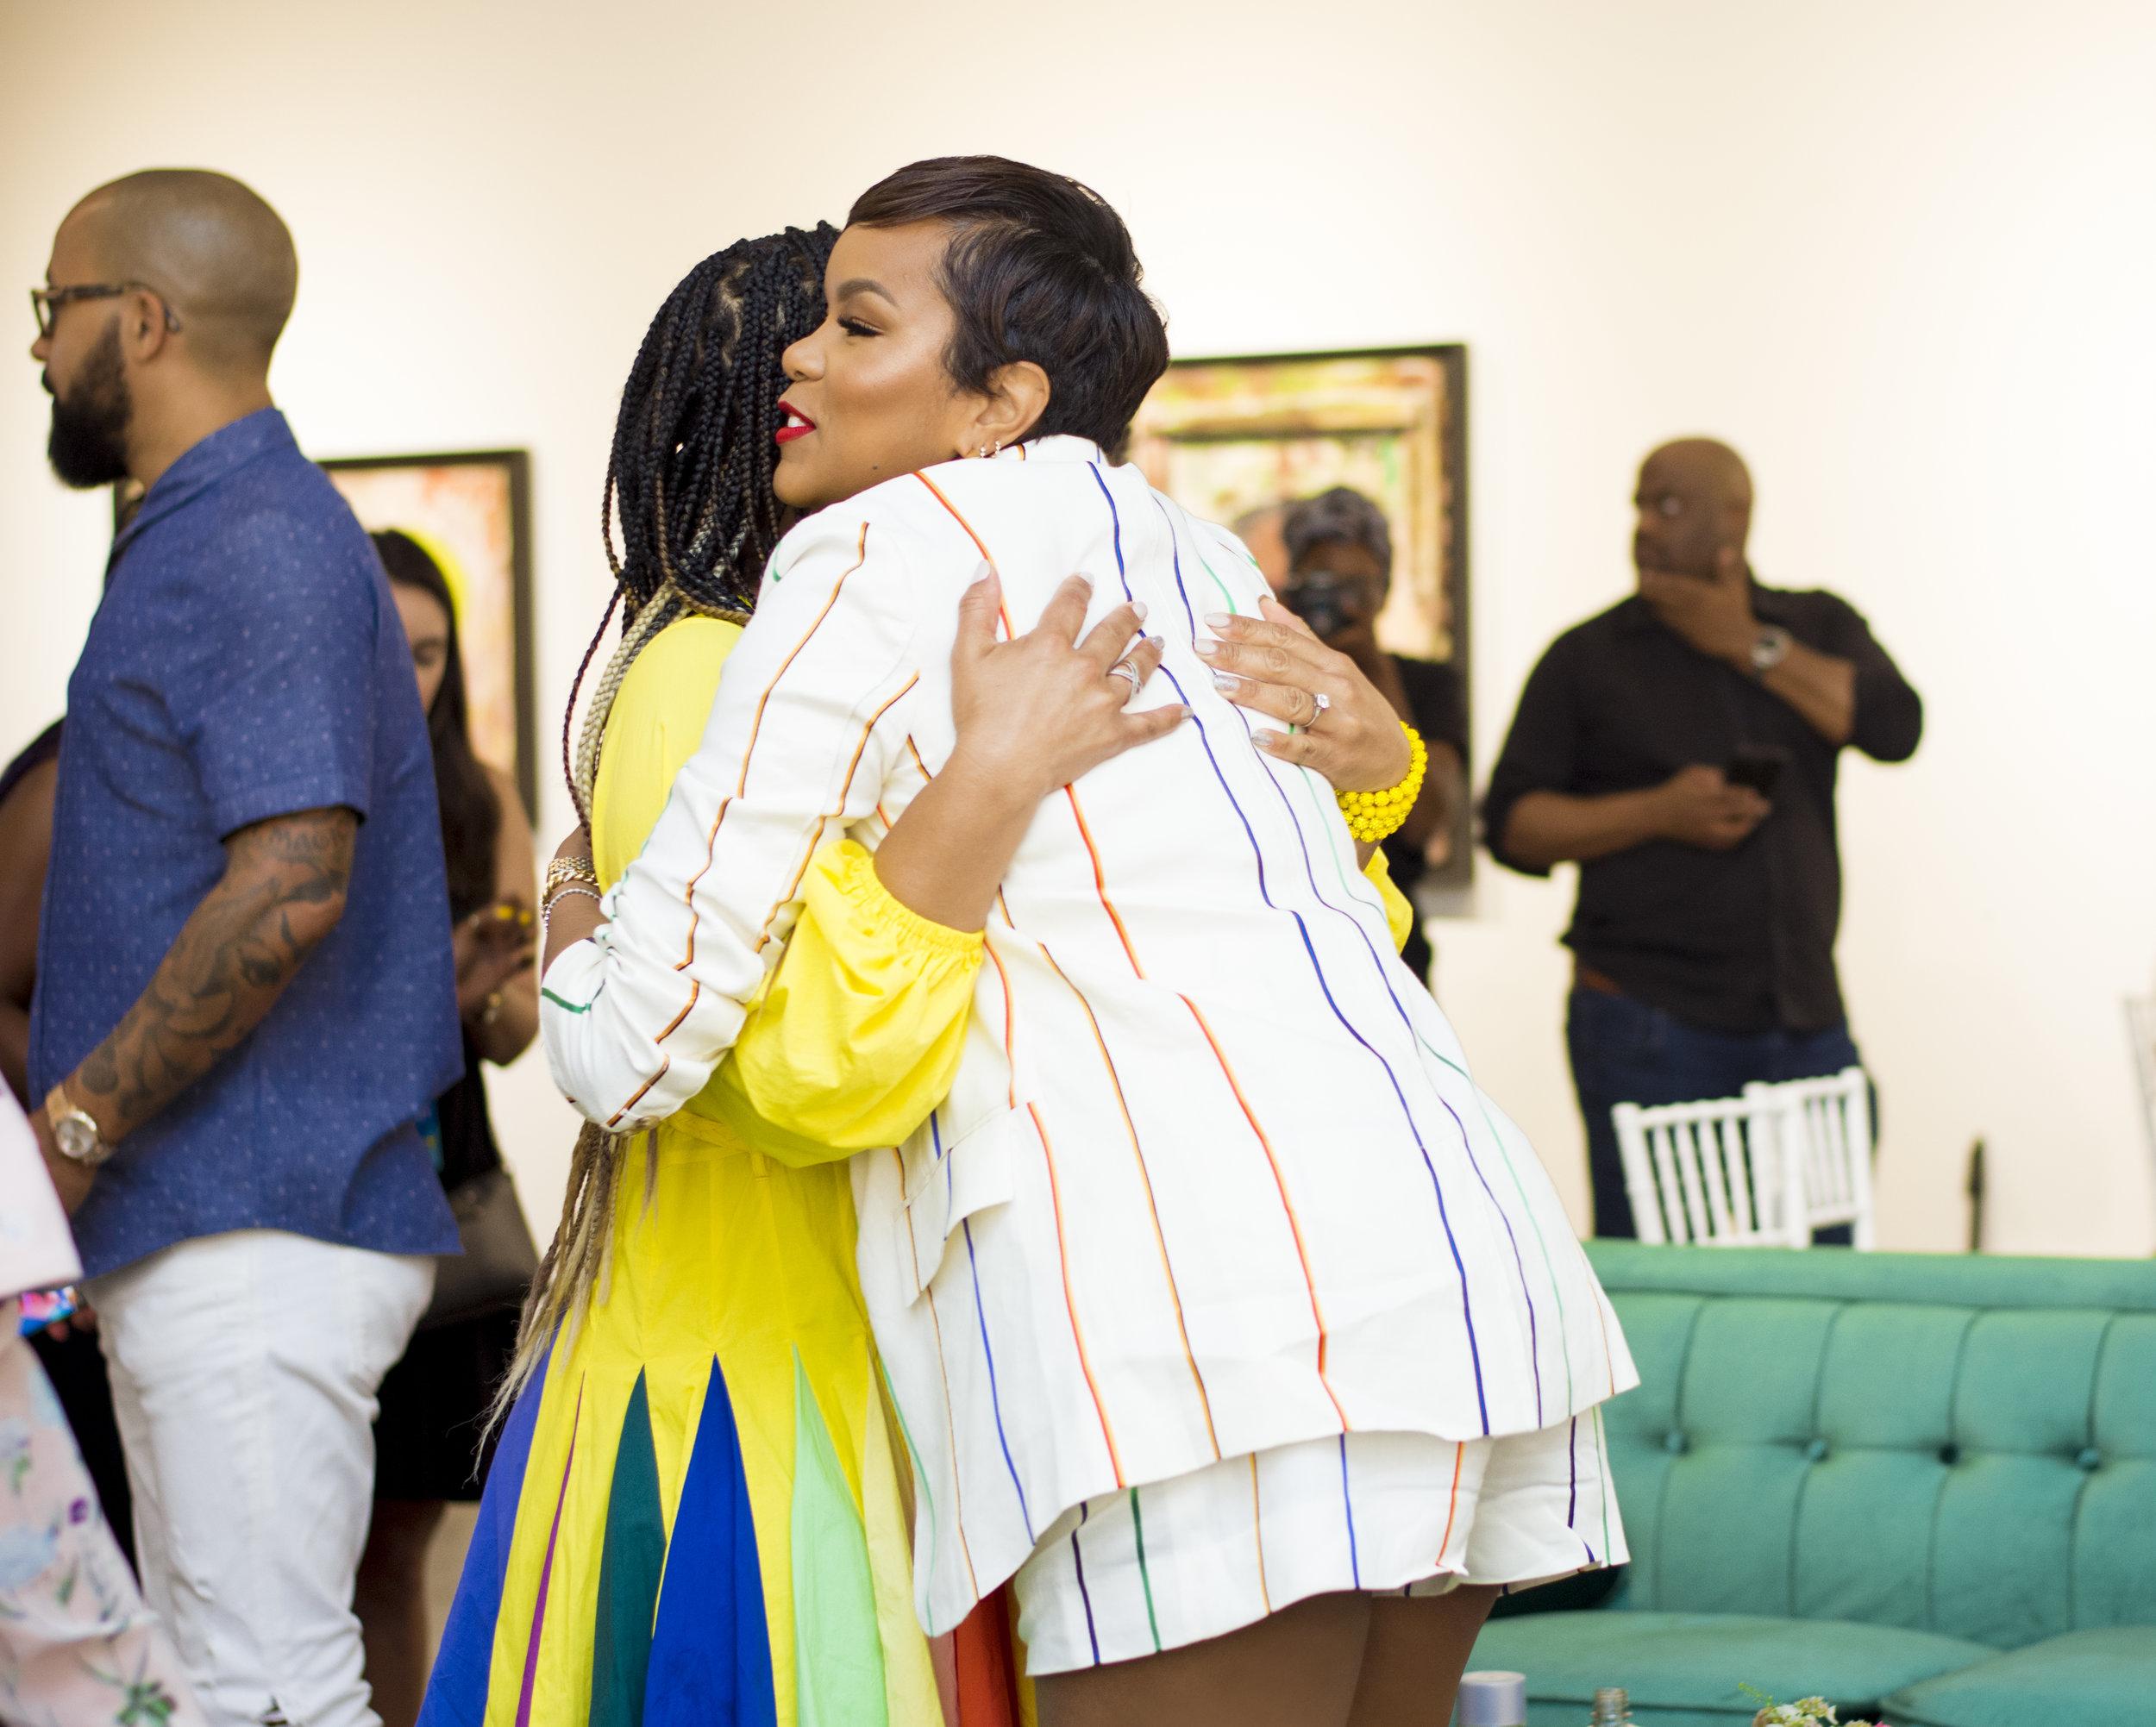 Latoya Luckett embracing Erica Campbell.